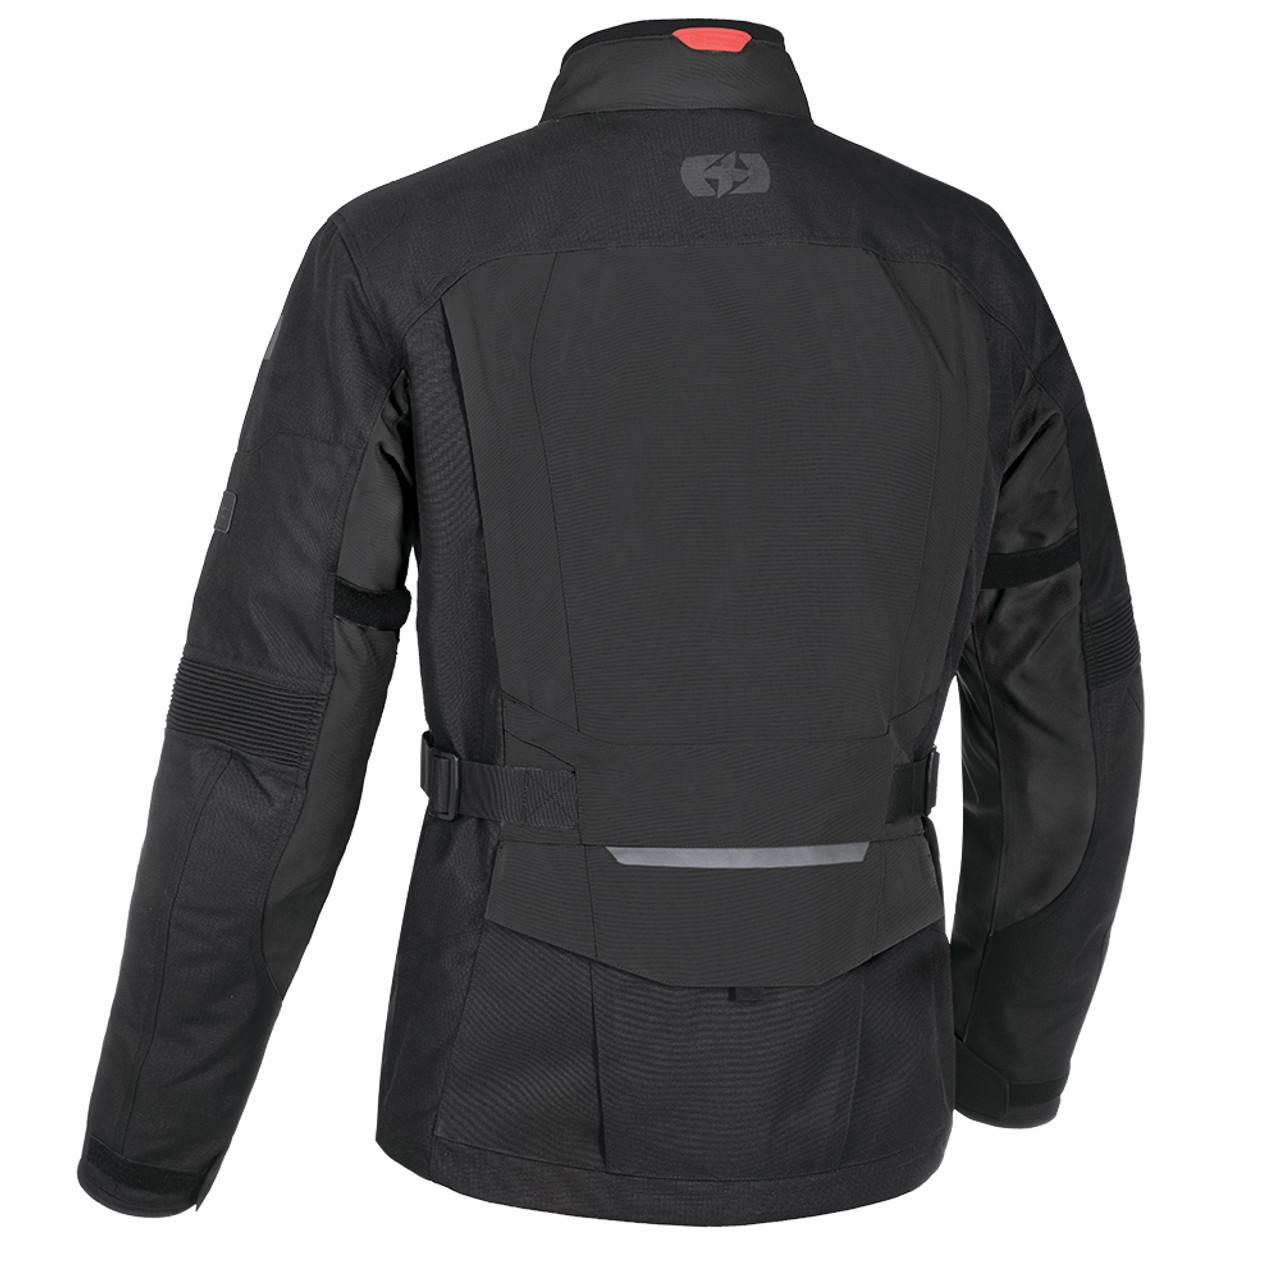 Oxford Continental Advanced Waterproof Jacket - Tech Black